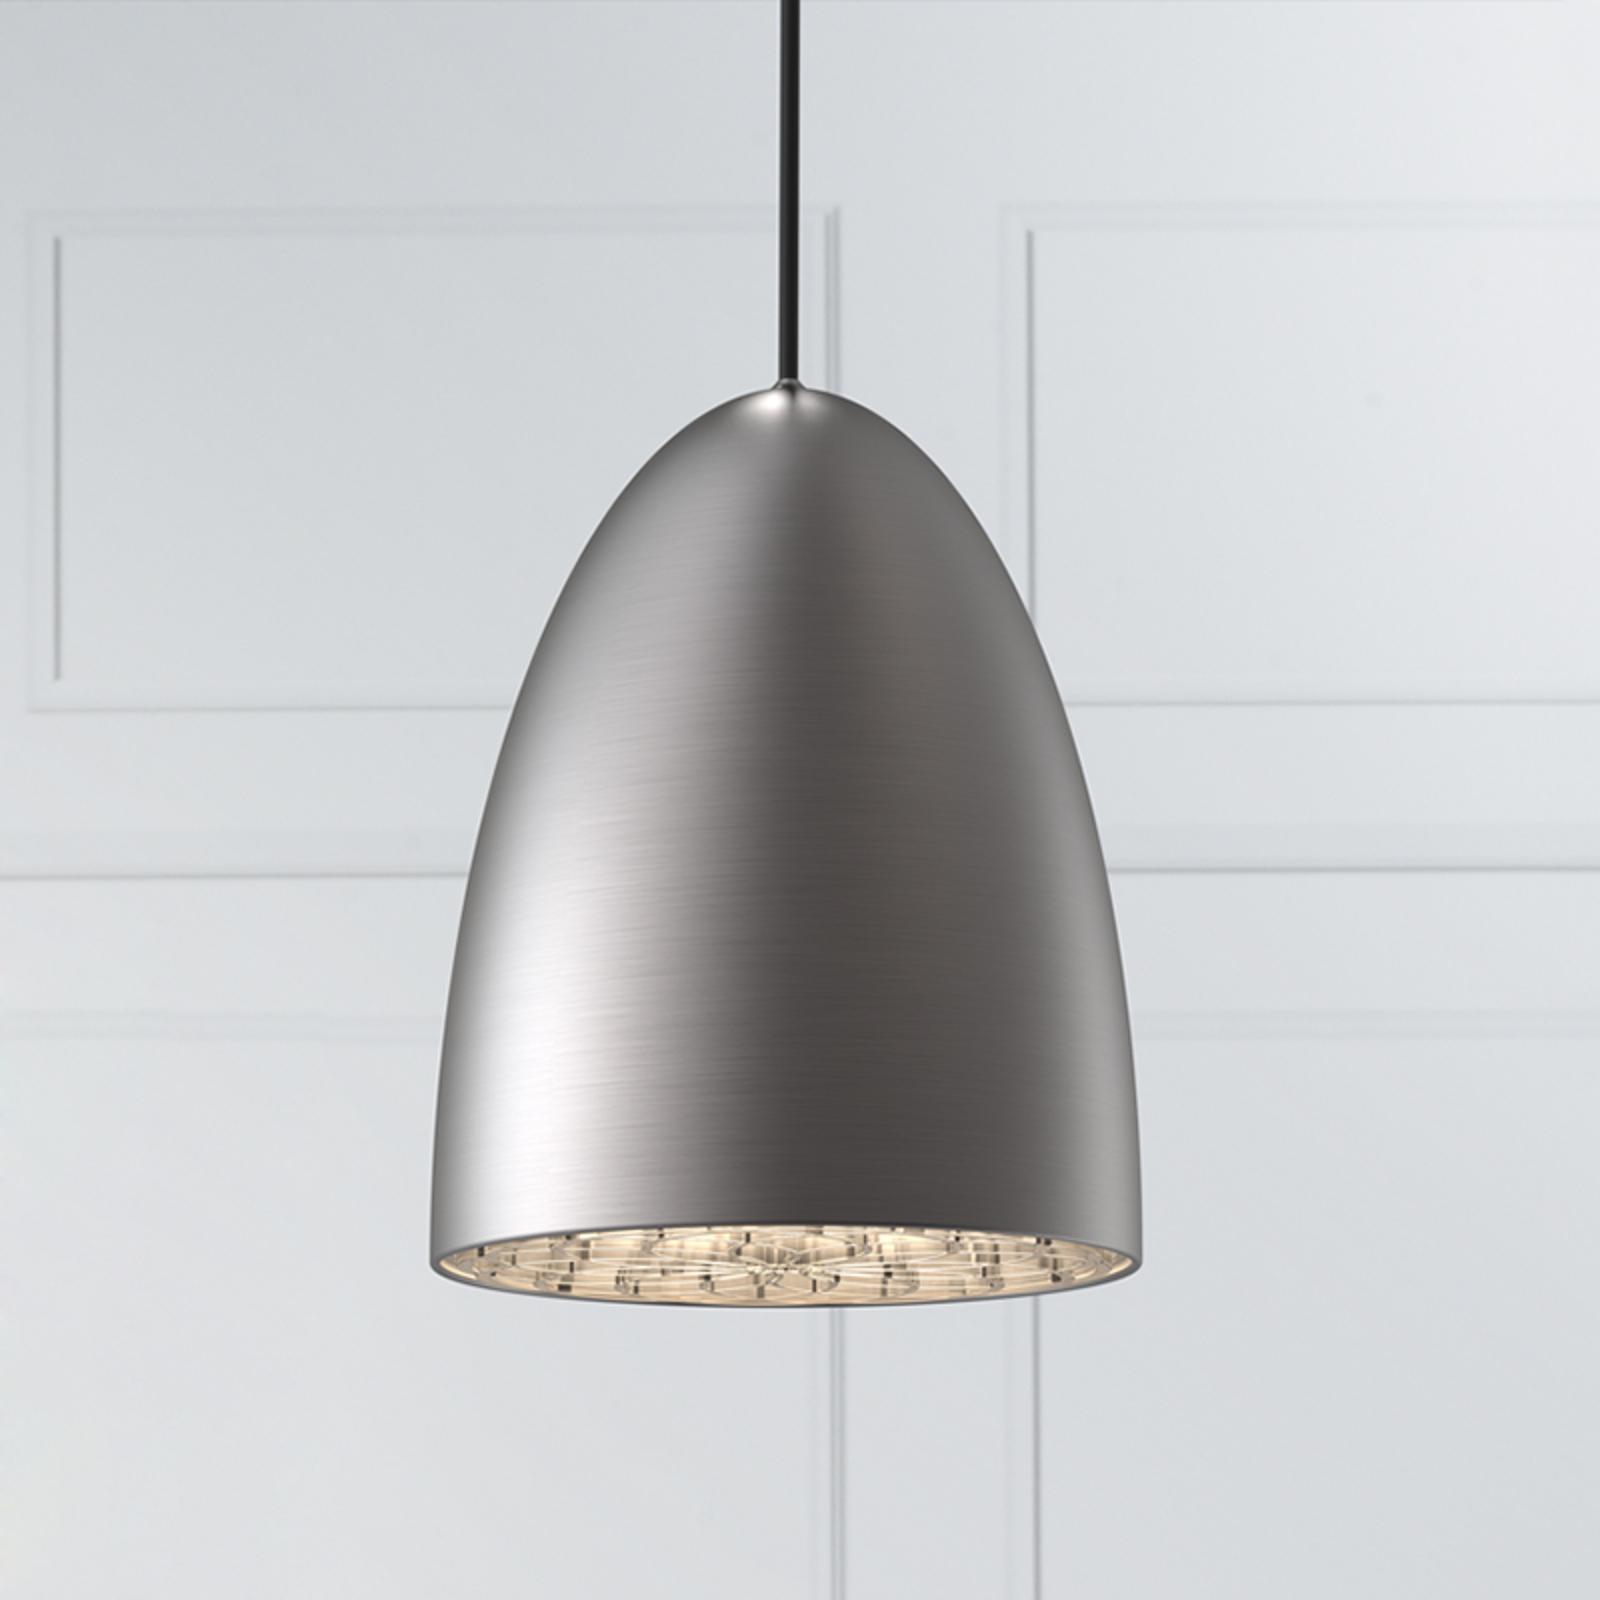 lampada a sospensione Nexus, ovale